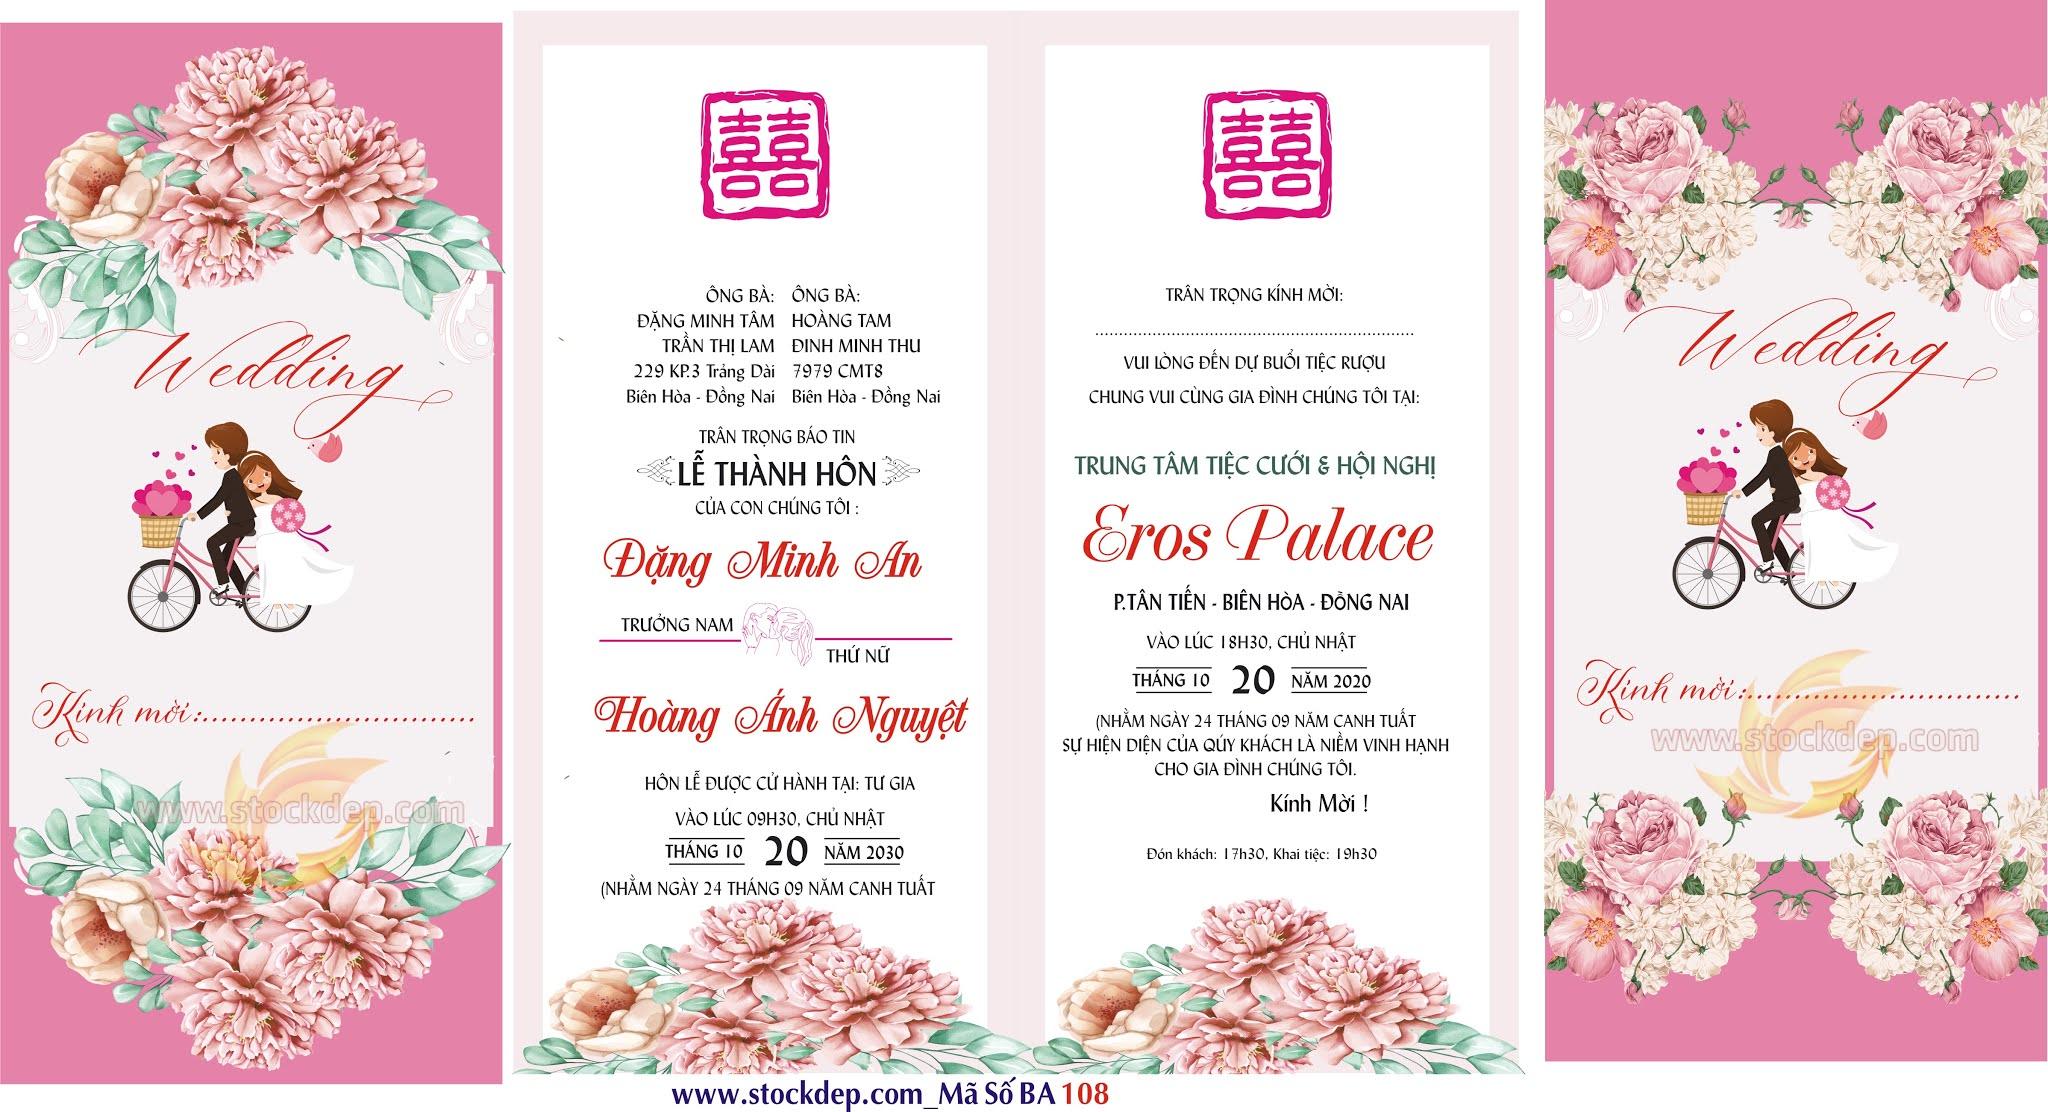 Wedding invite, invitation menu rsvp thank you card vector floral design green fern frond